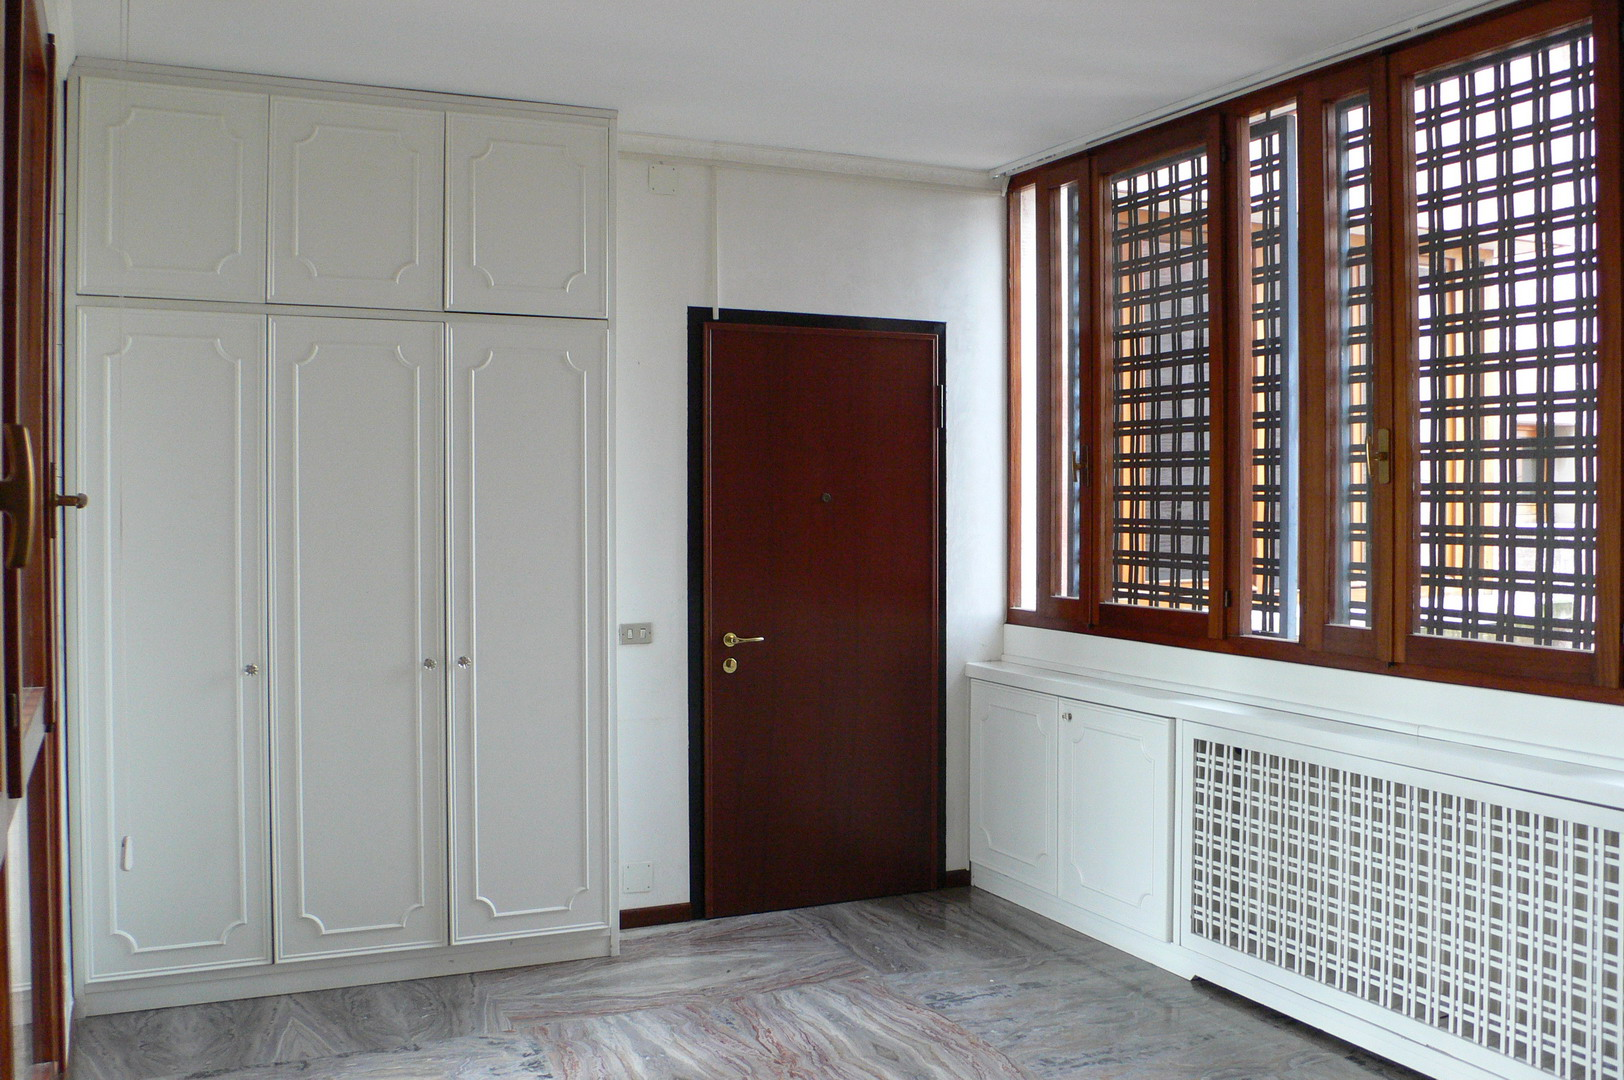 Treviso centro storico vendesi appartamento tv832 for Vendesi appartamento